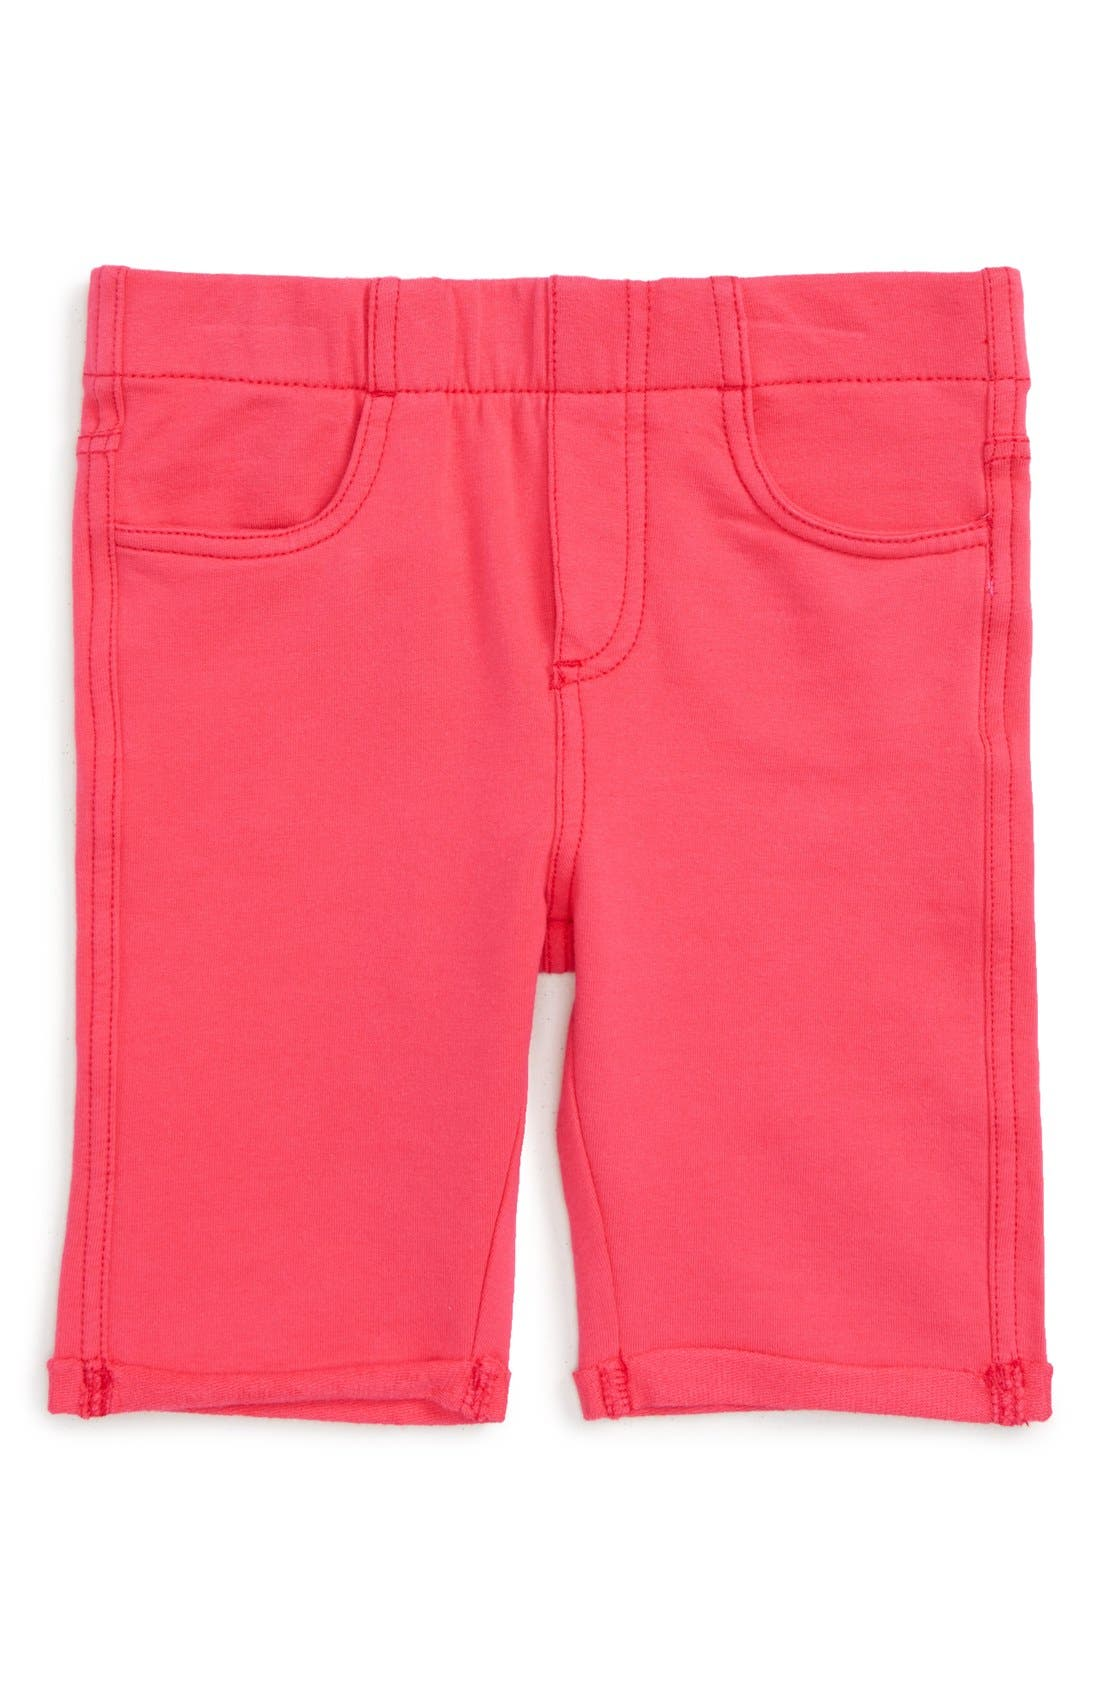 'Jenna' Jegging Shorts,                             Main thumbnail 9, color,